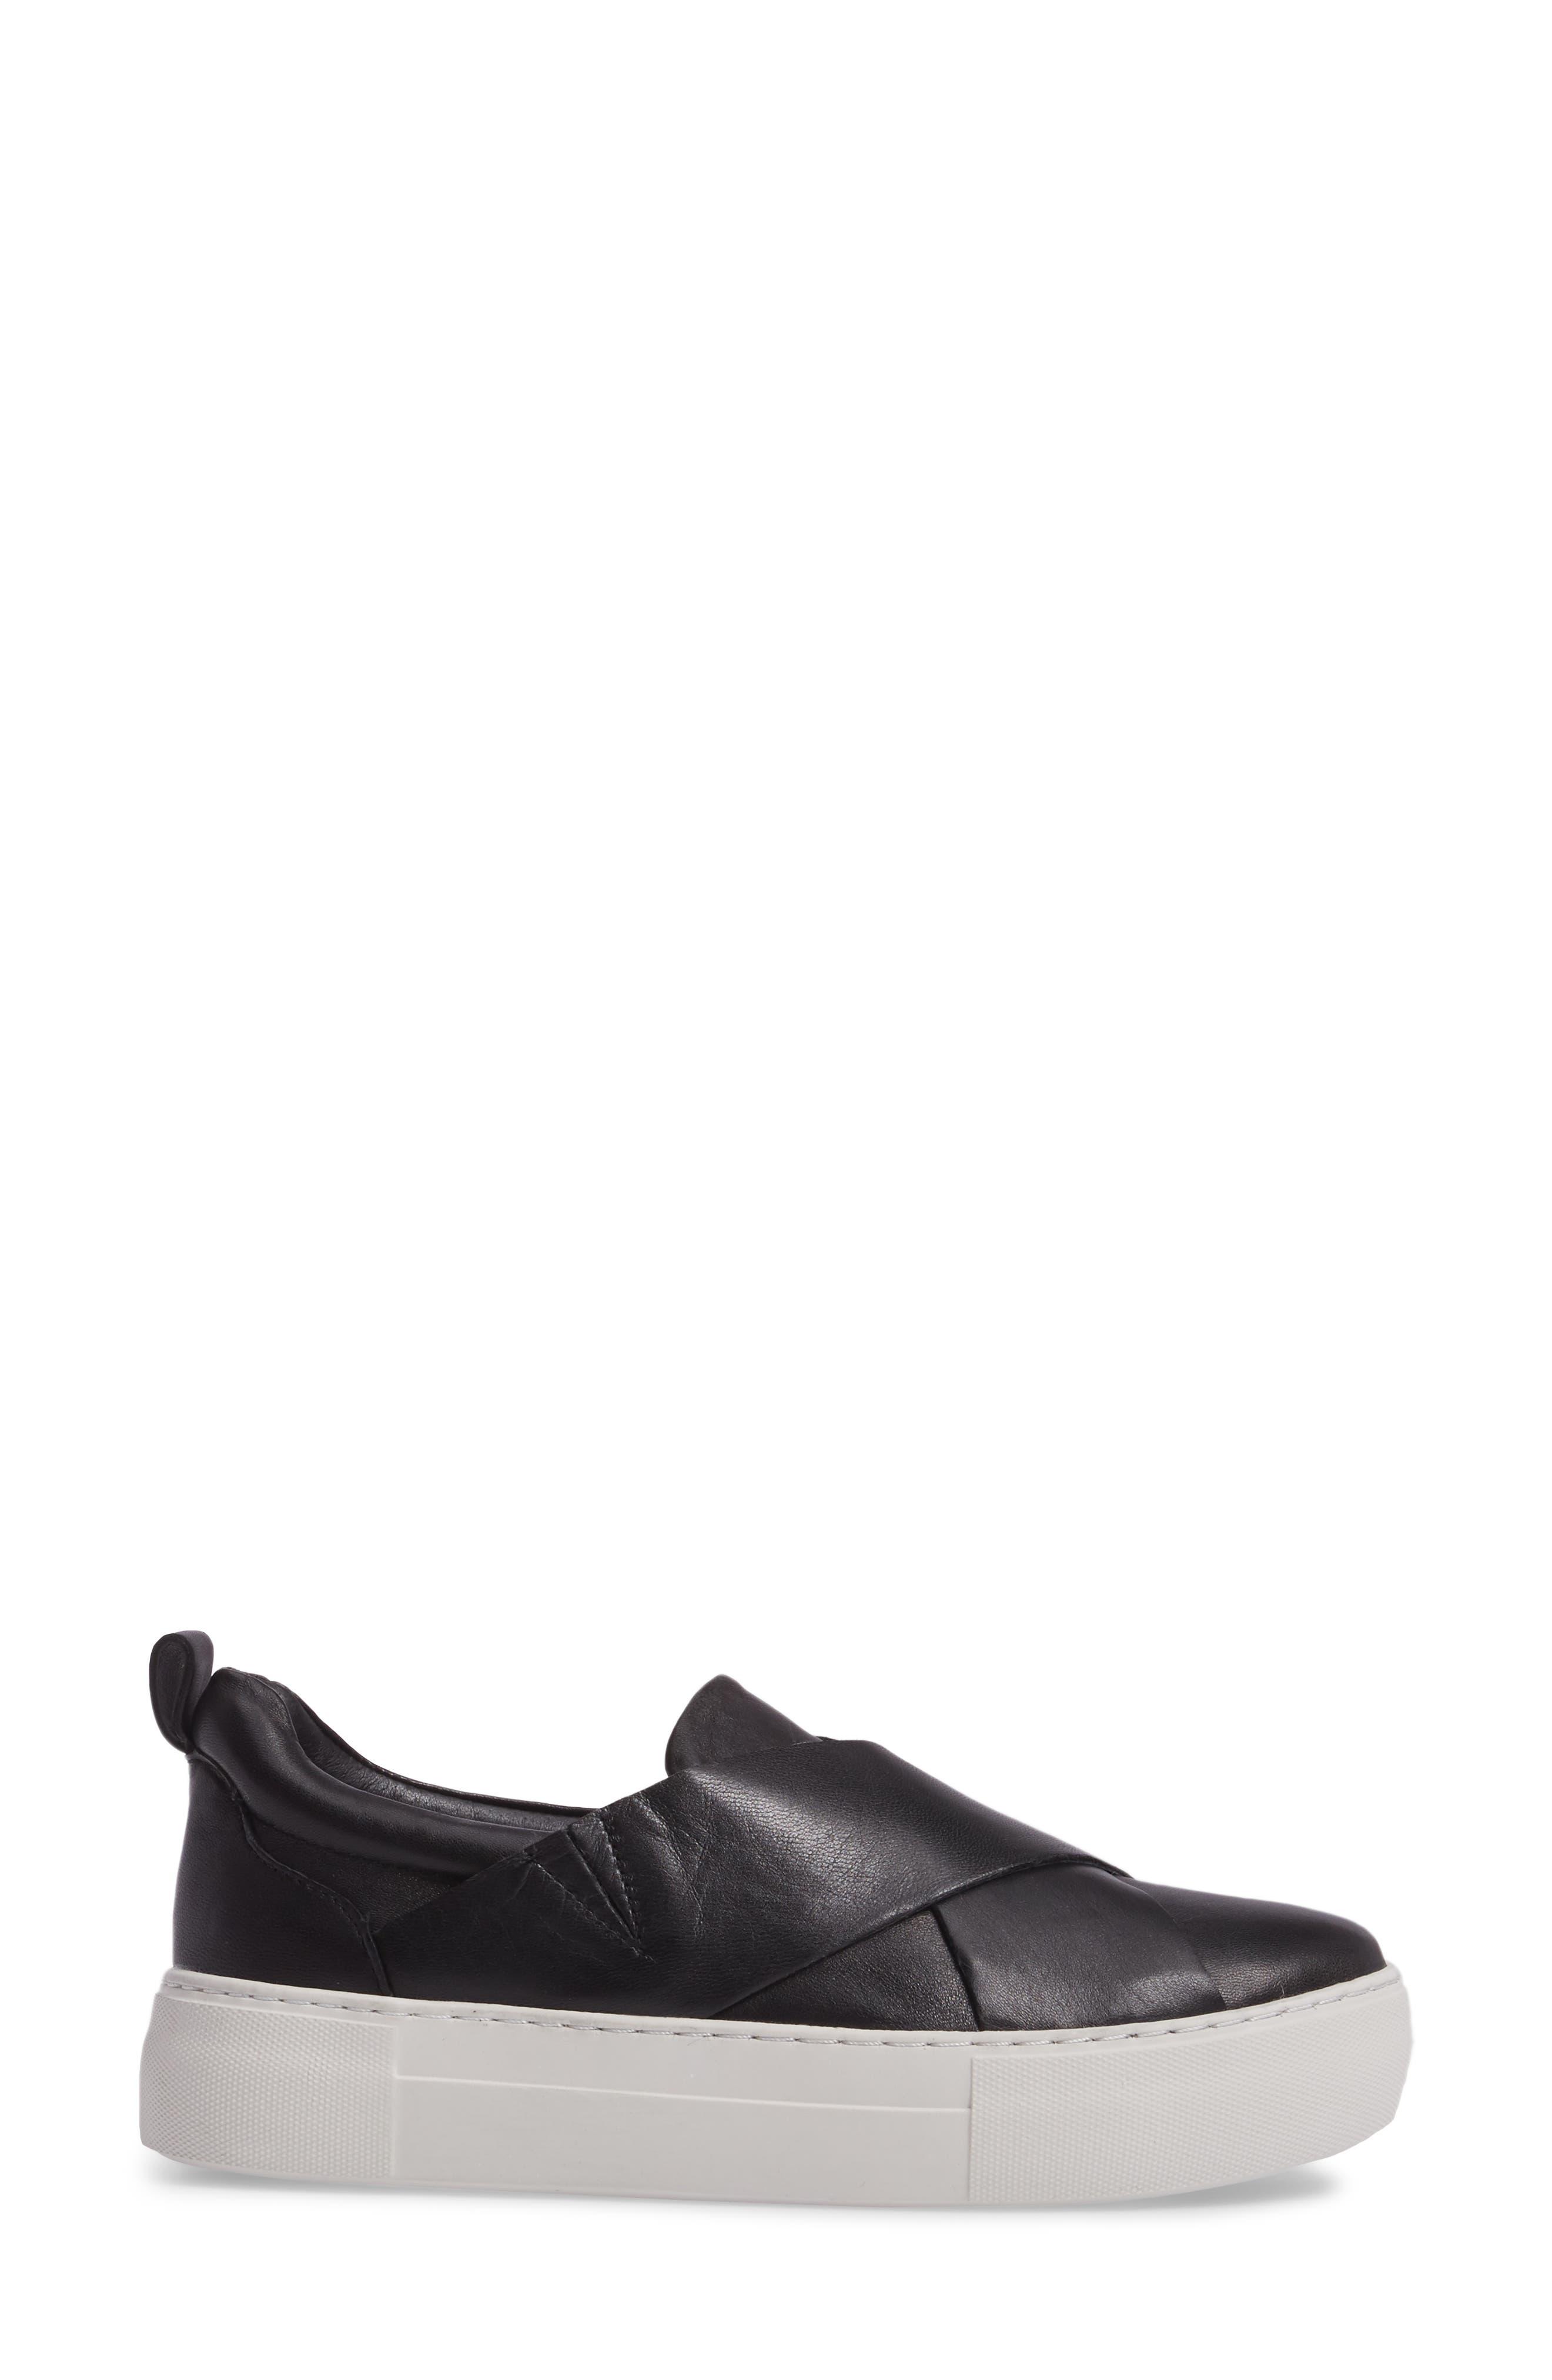 Alec Slip-On Sneaker,                             Alternate thumbnail 3, color,                             Black Leather